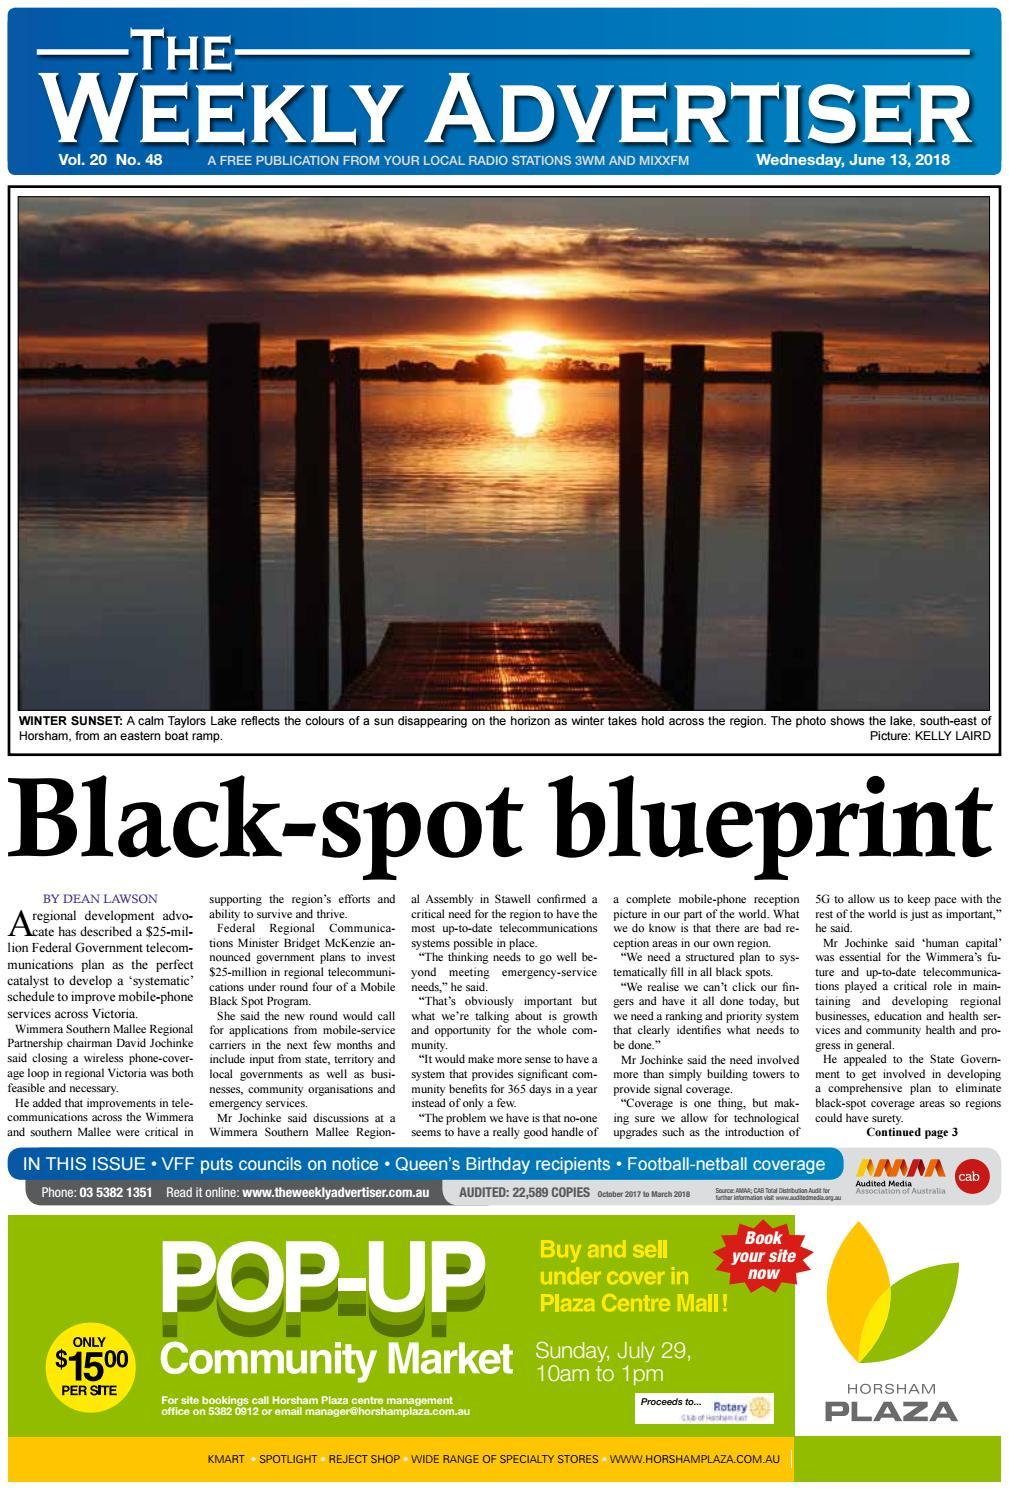 ebfa384c75db The Weekly Advertiser - Wednesday